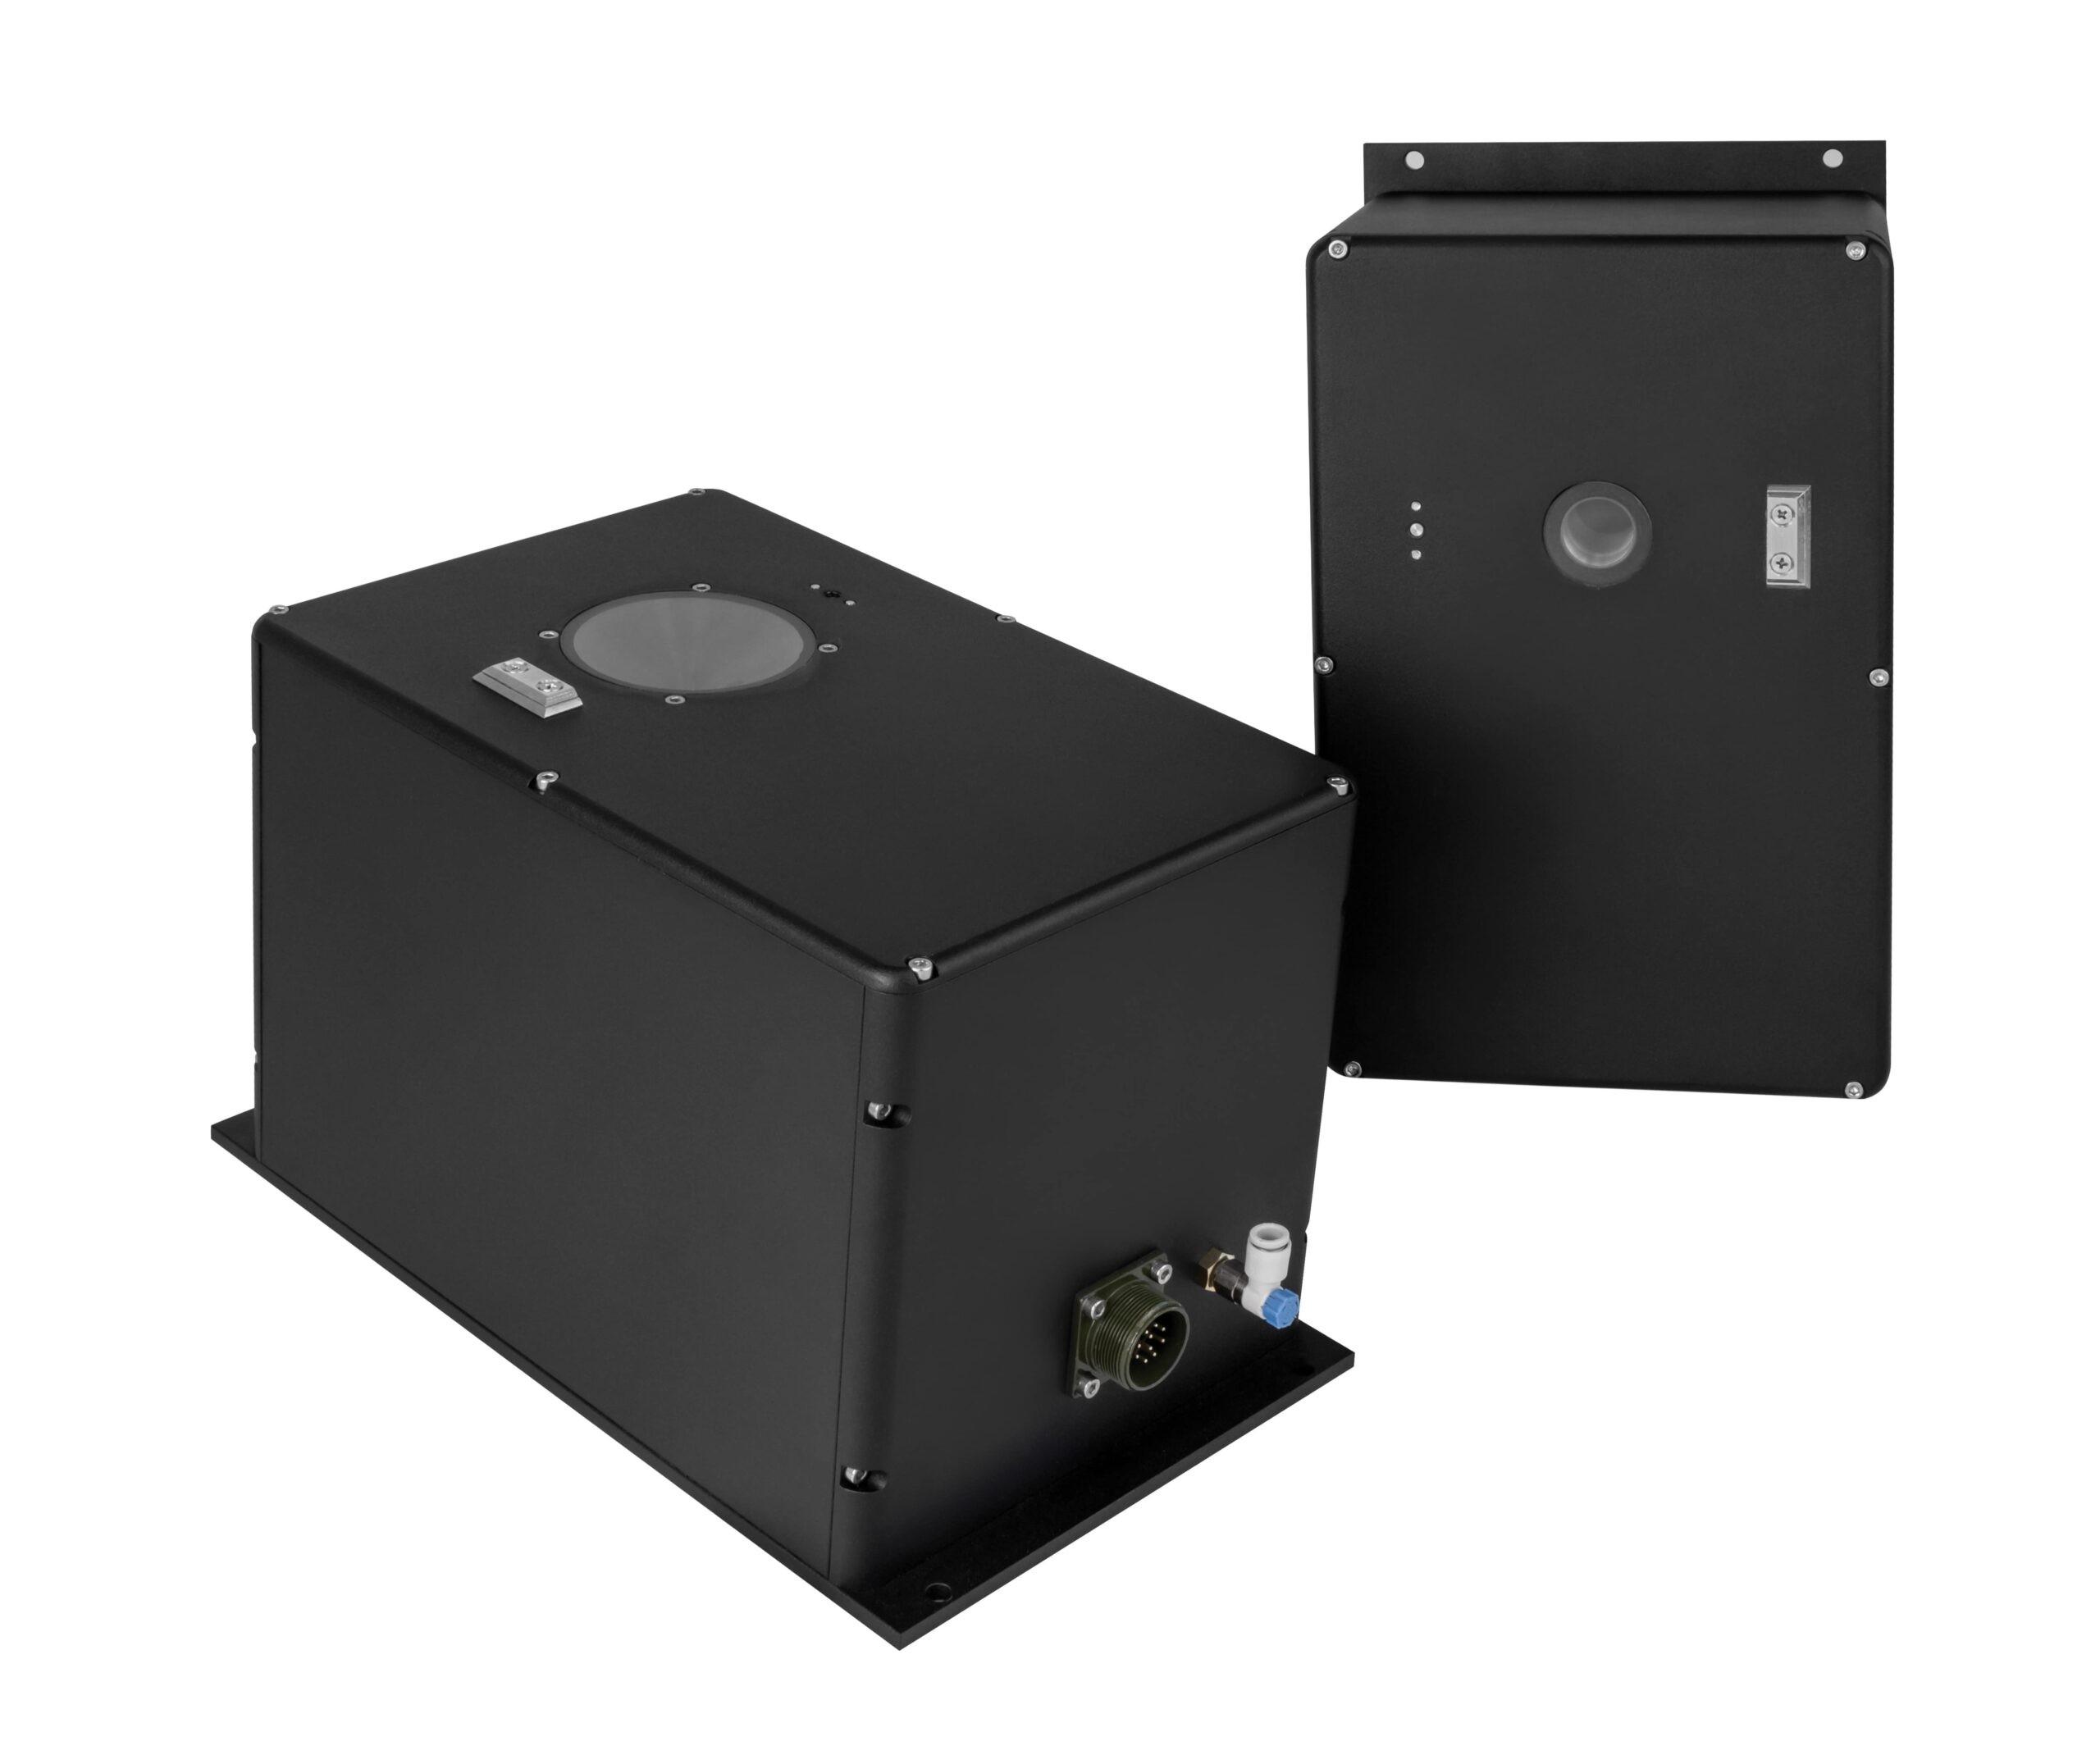 Moisture and basis weight sensor A427